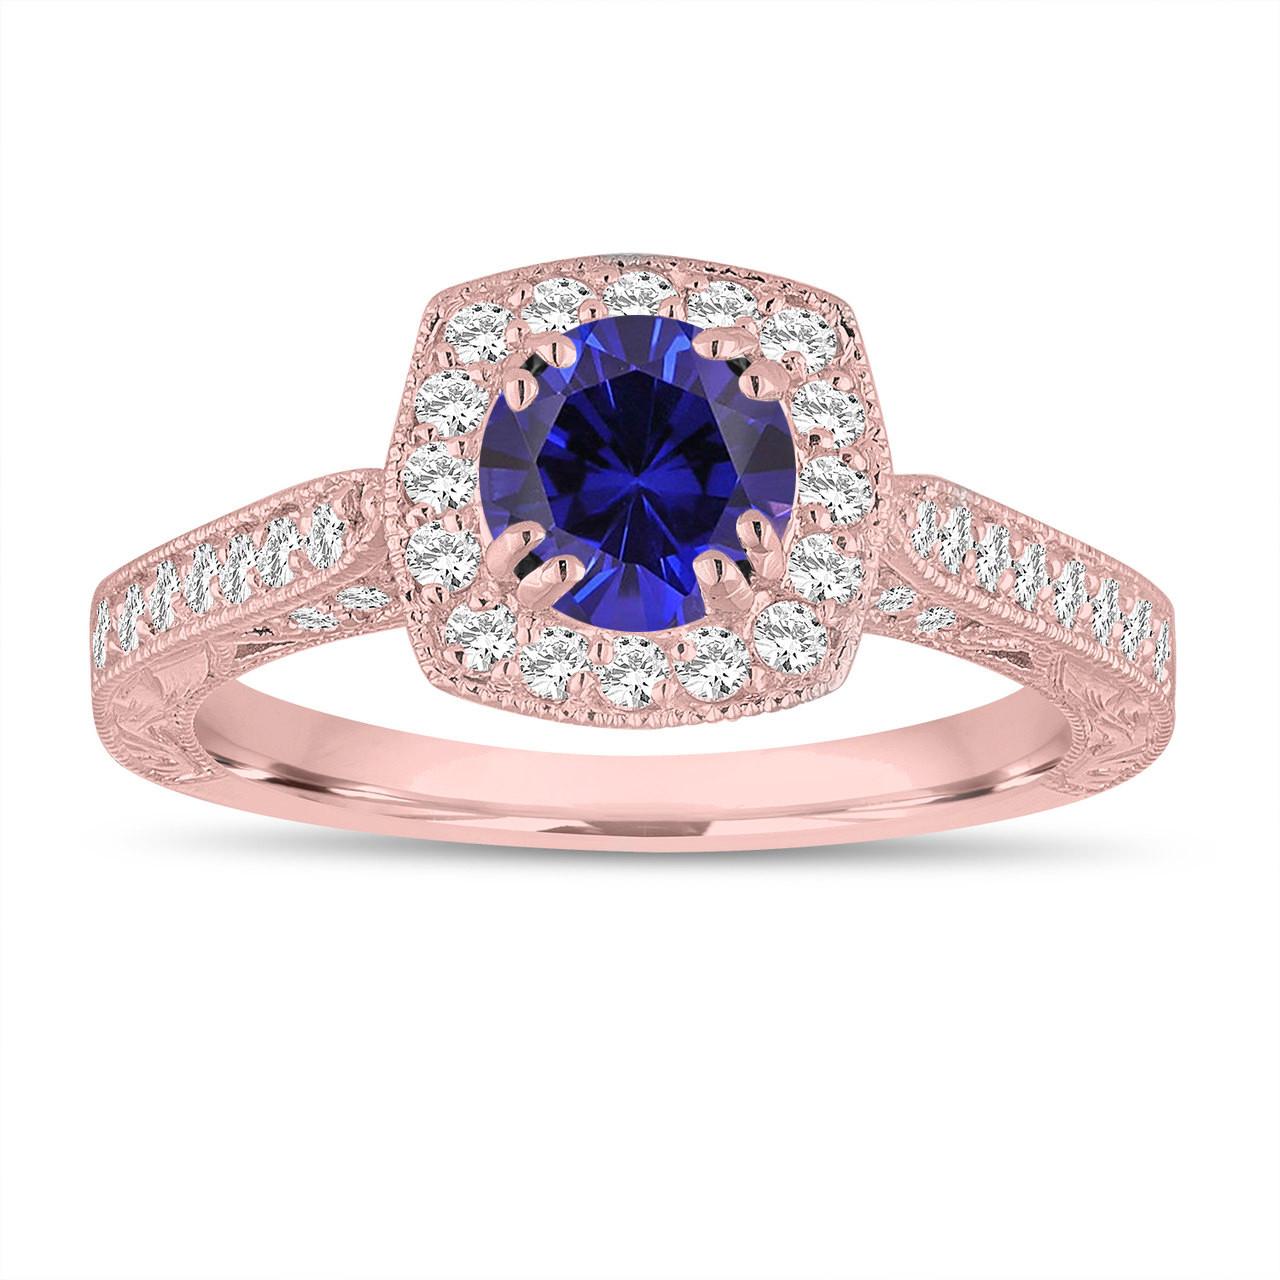 Blue Sapphire And Diamonds Engagement Ring 1 50 Carat 14k